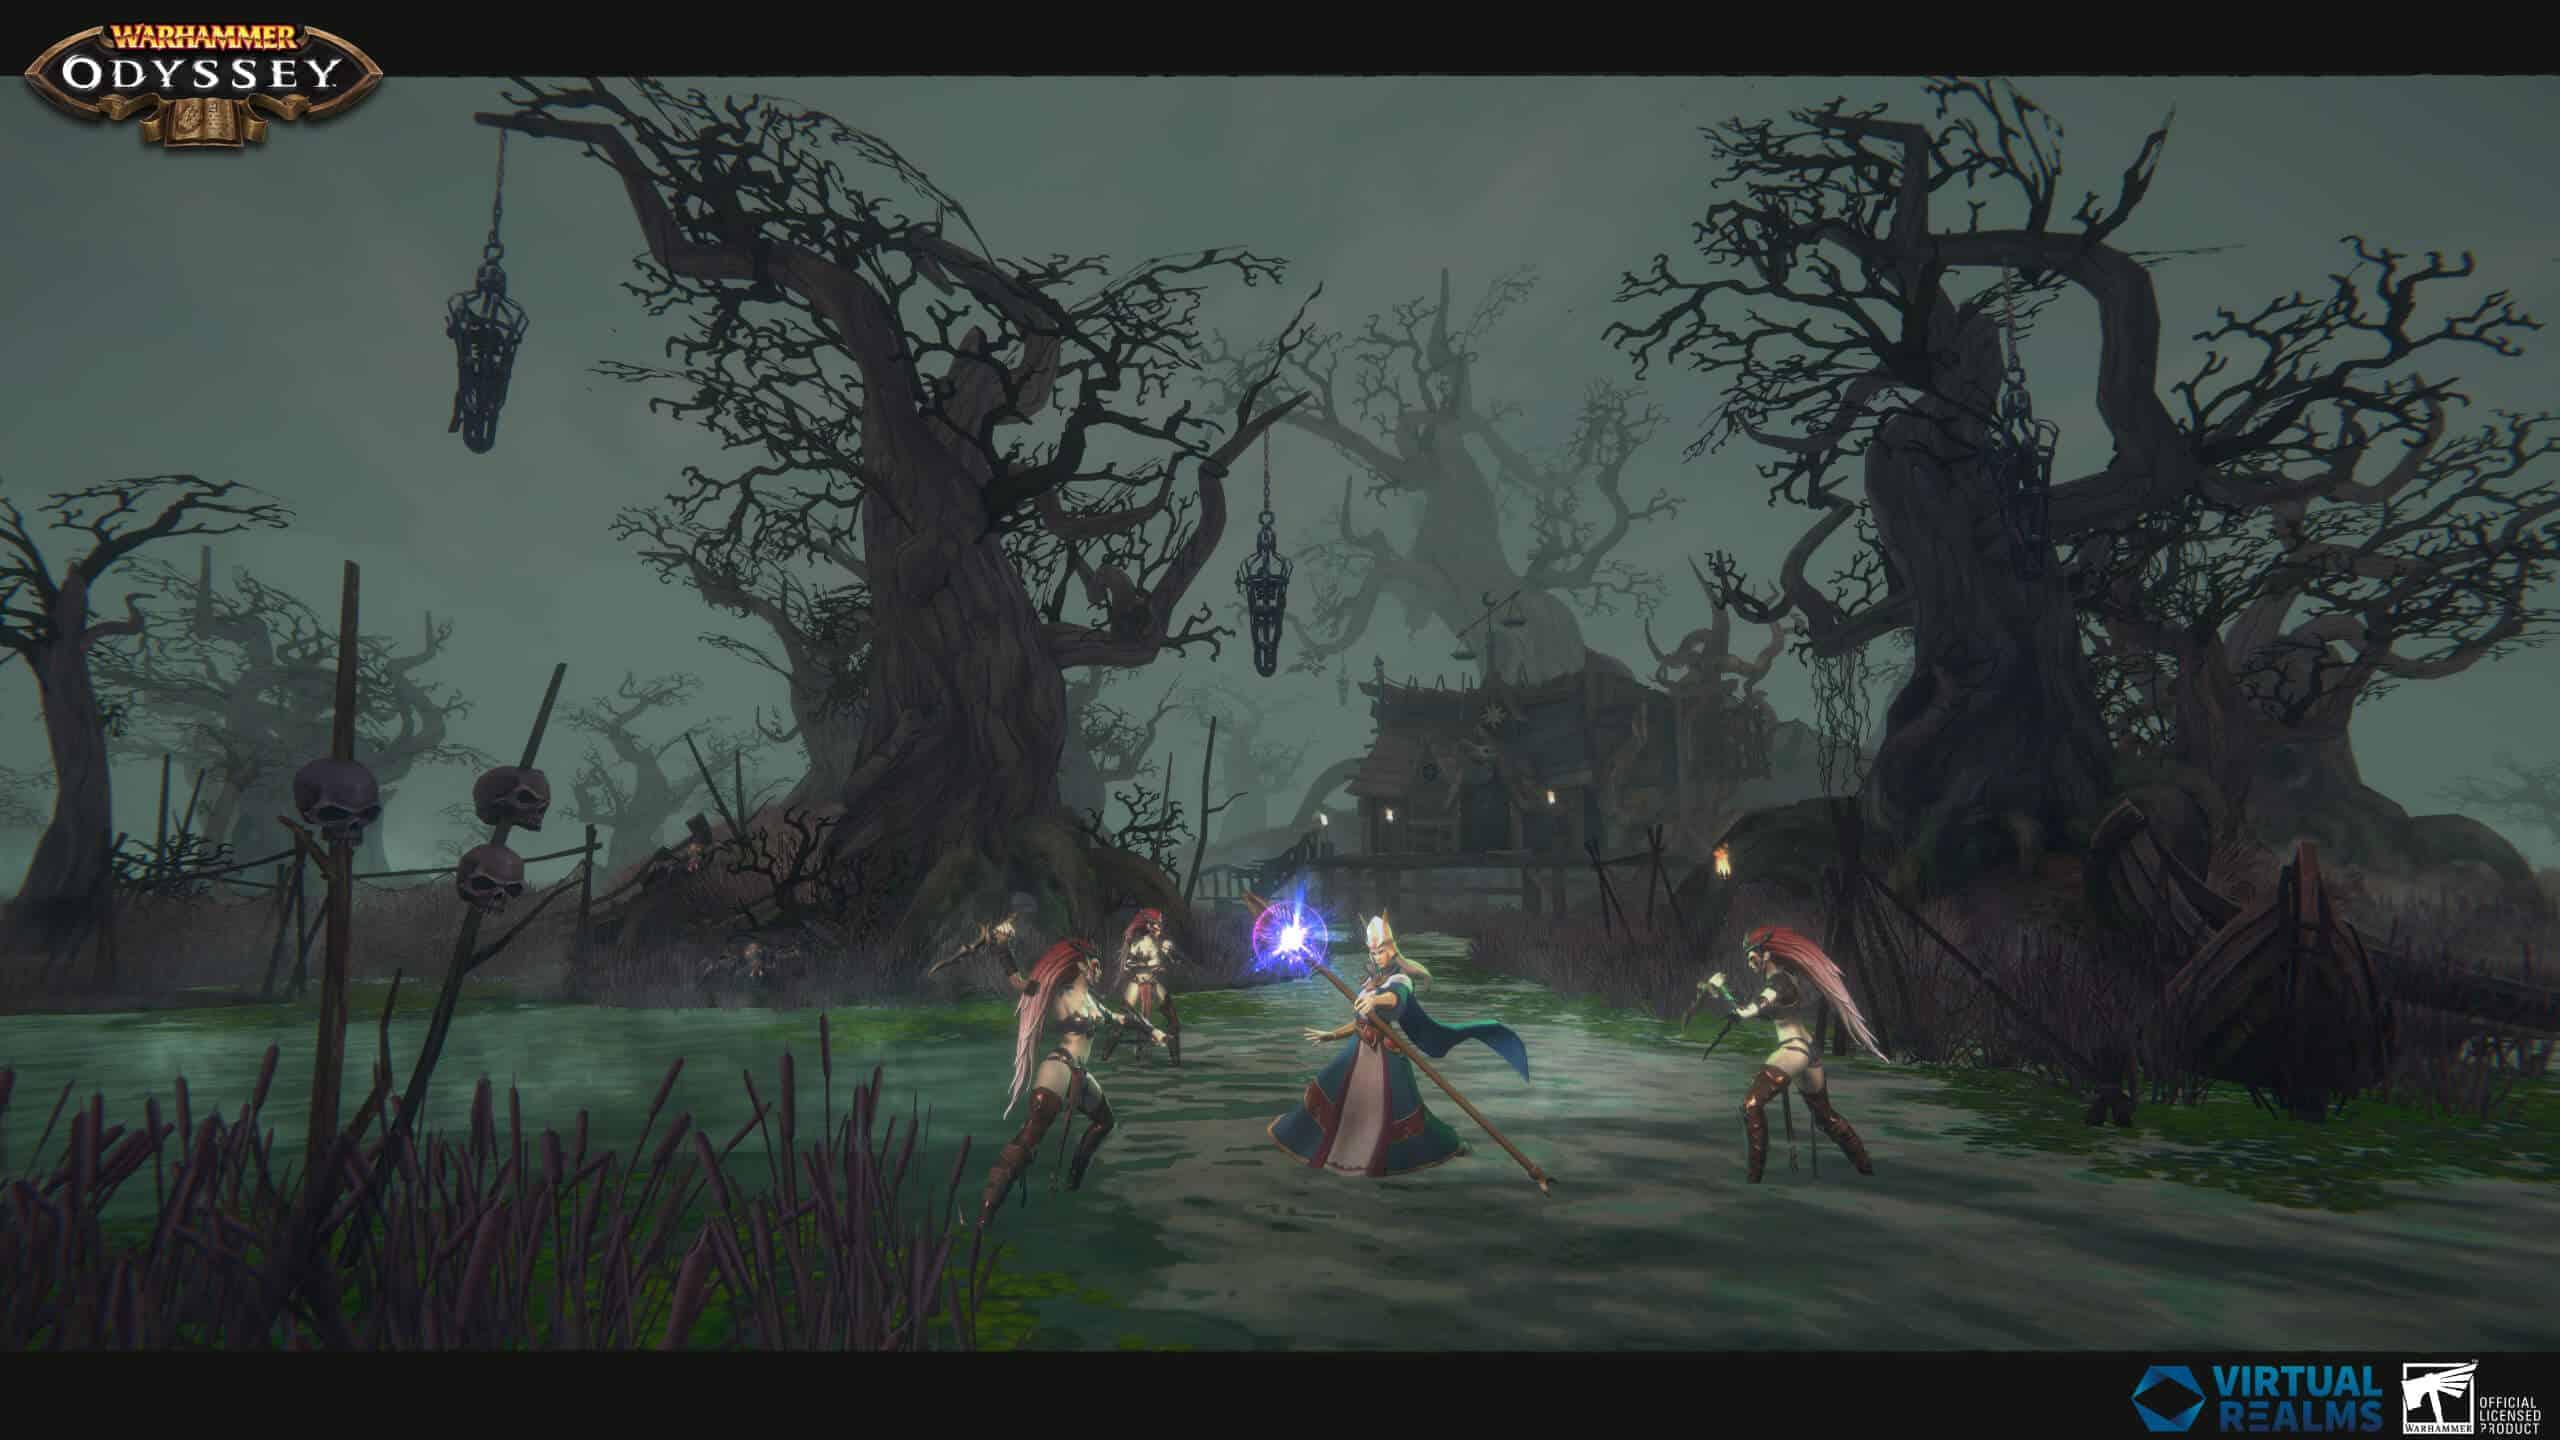 Warhammer Odyssey 3